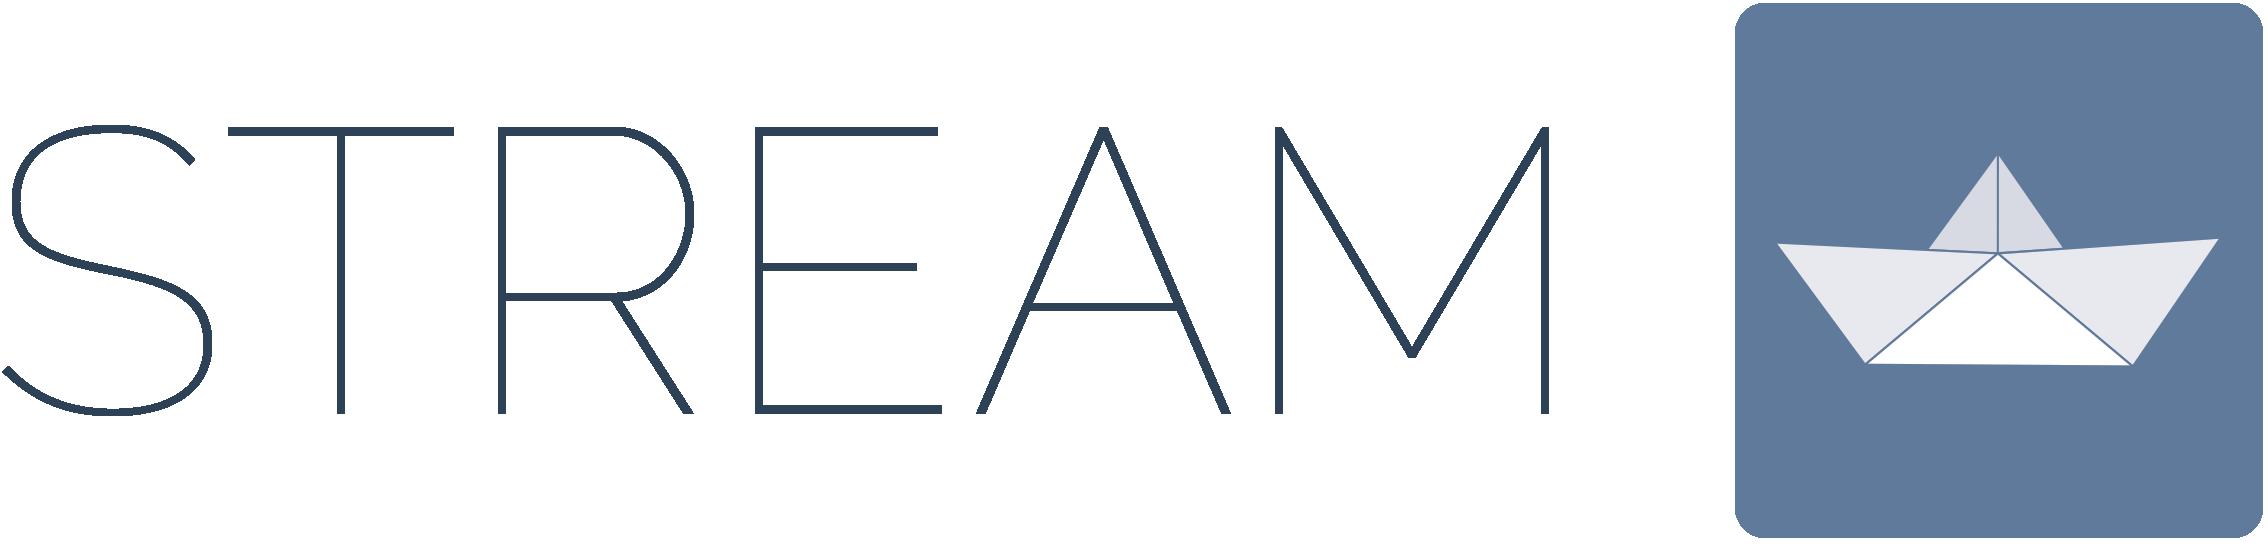 Build scalable newsfeeds and activity streams using getstream.io